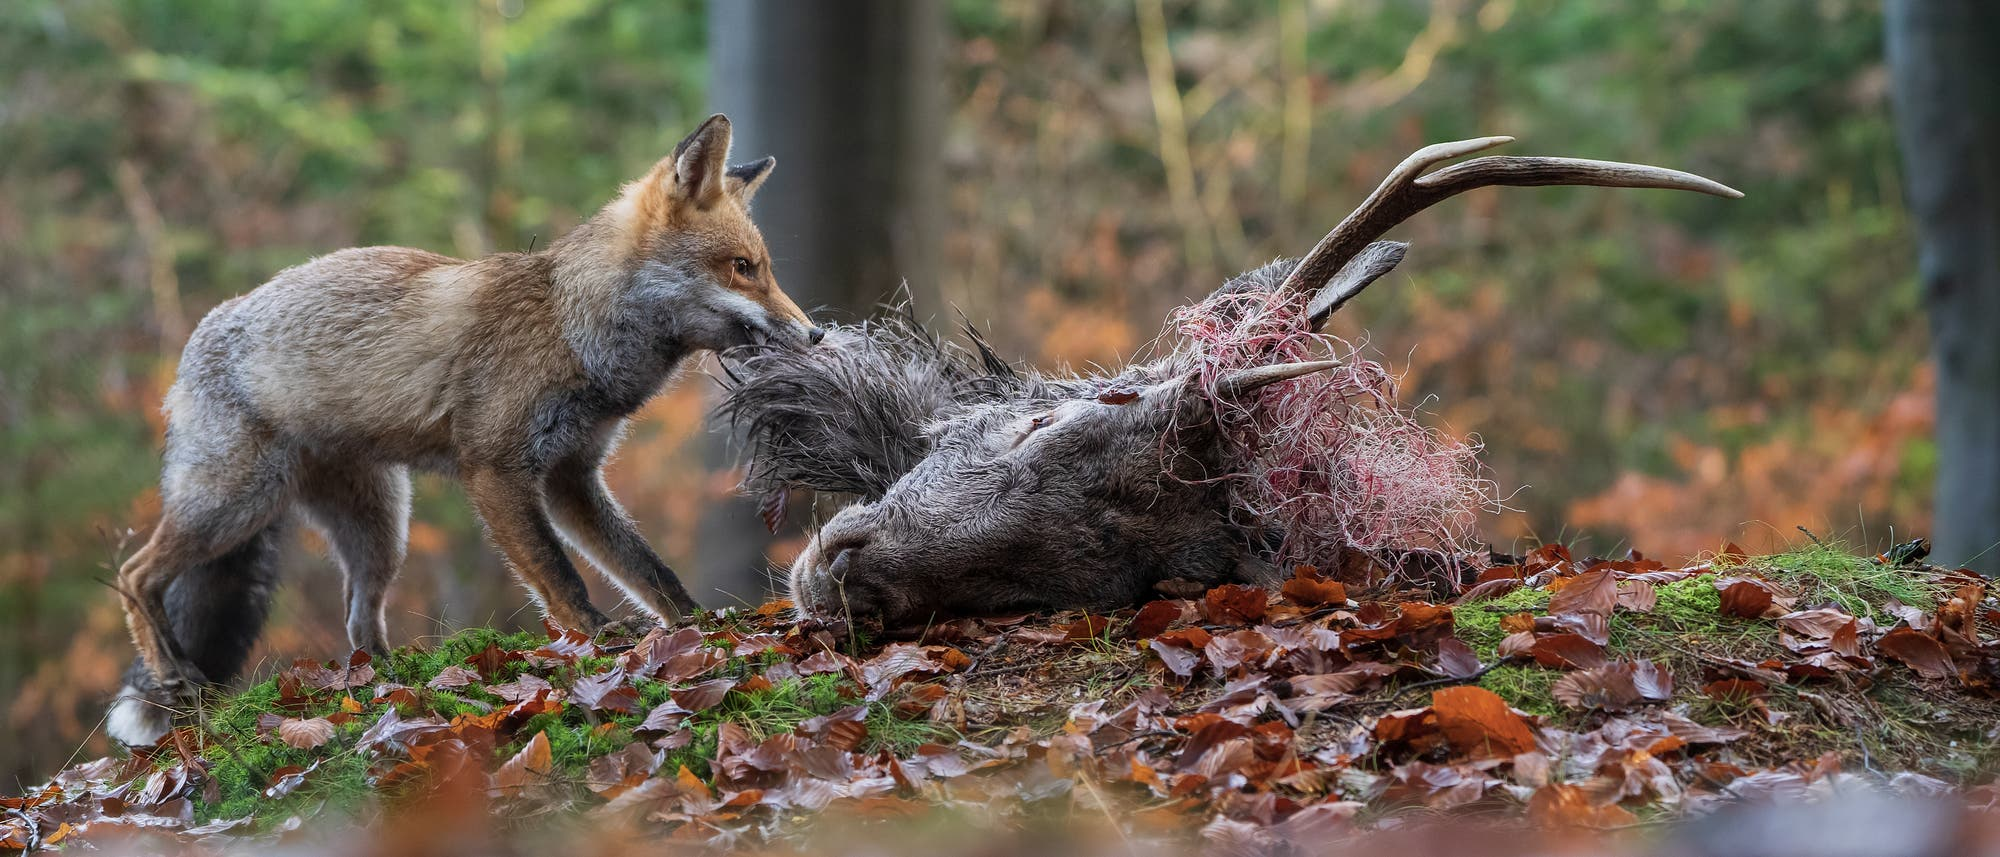 Fuchs frisst toten Rehbock